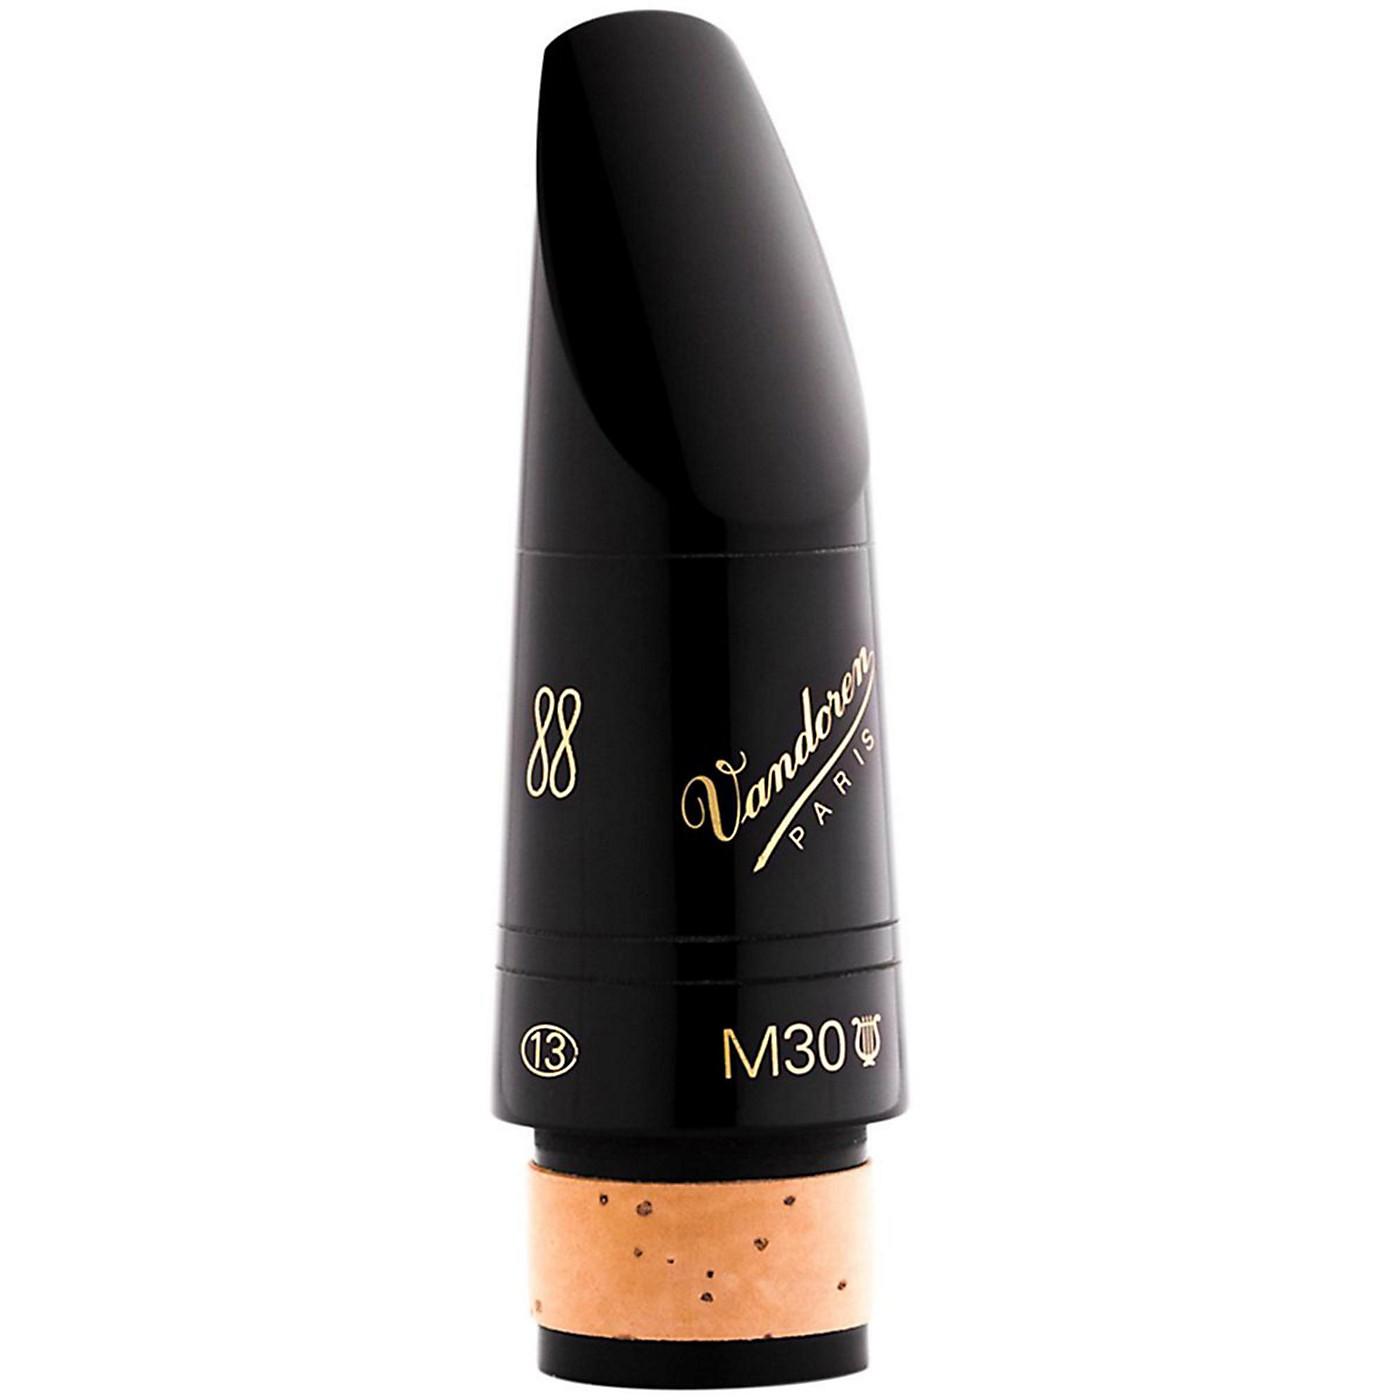 Vandoren M30 Lyre Bb Clarinet mouthpiece thumbnail